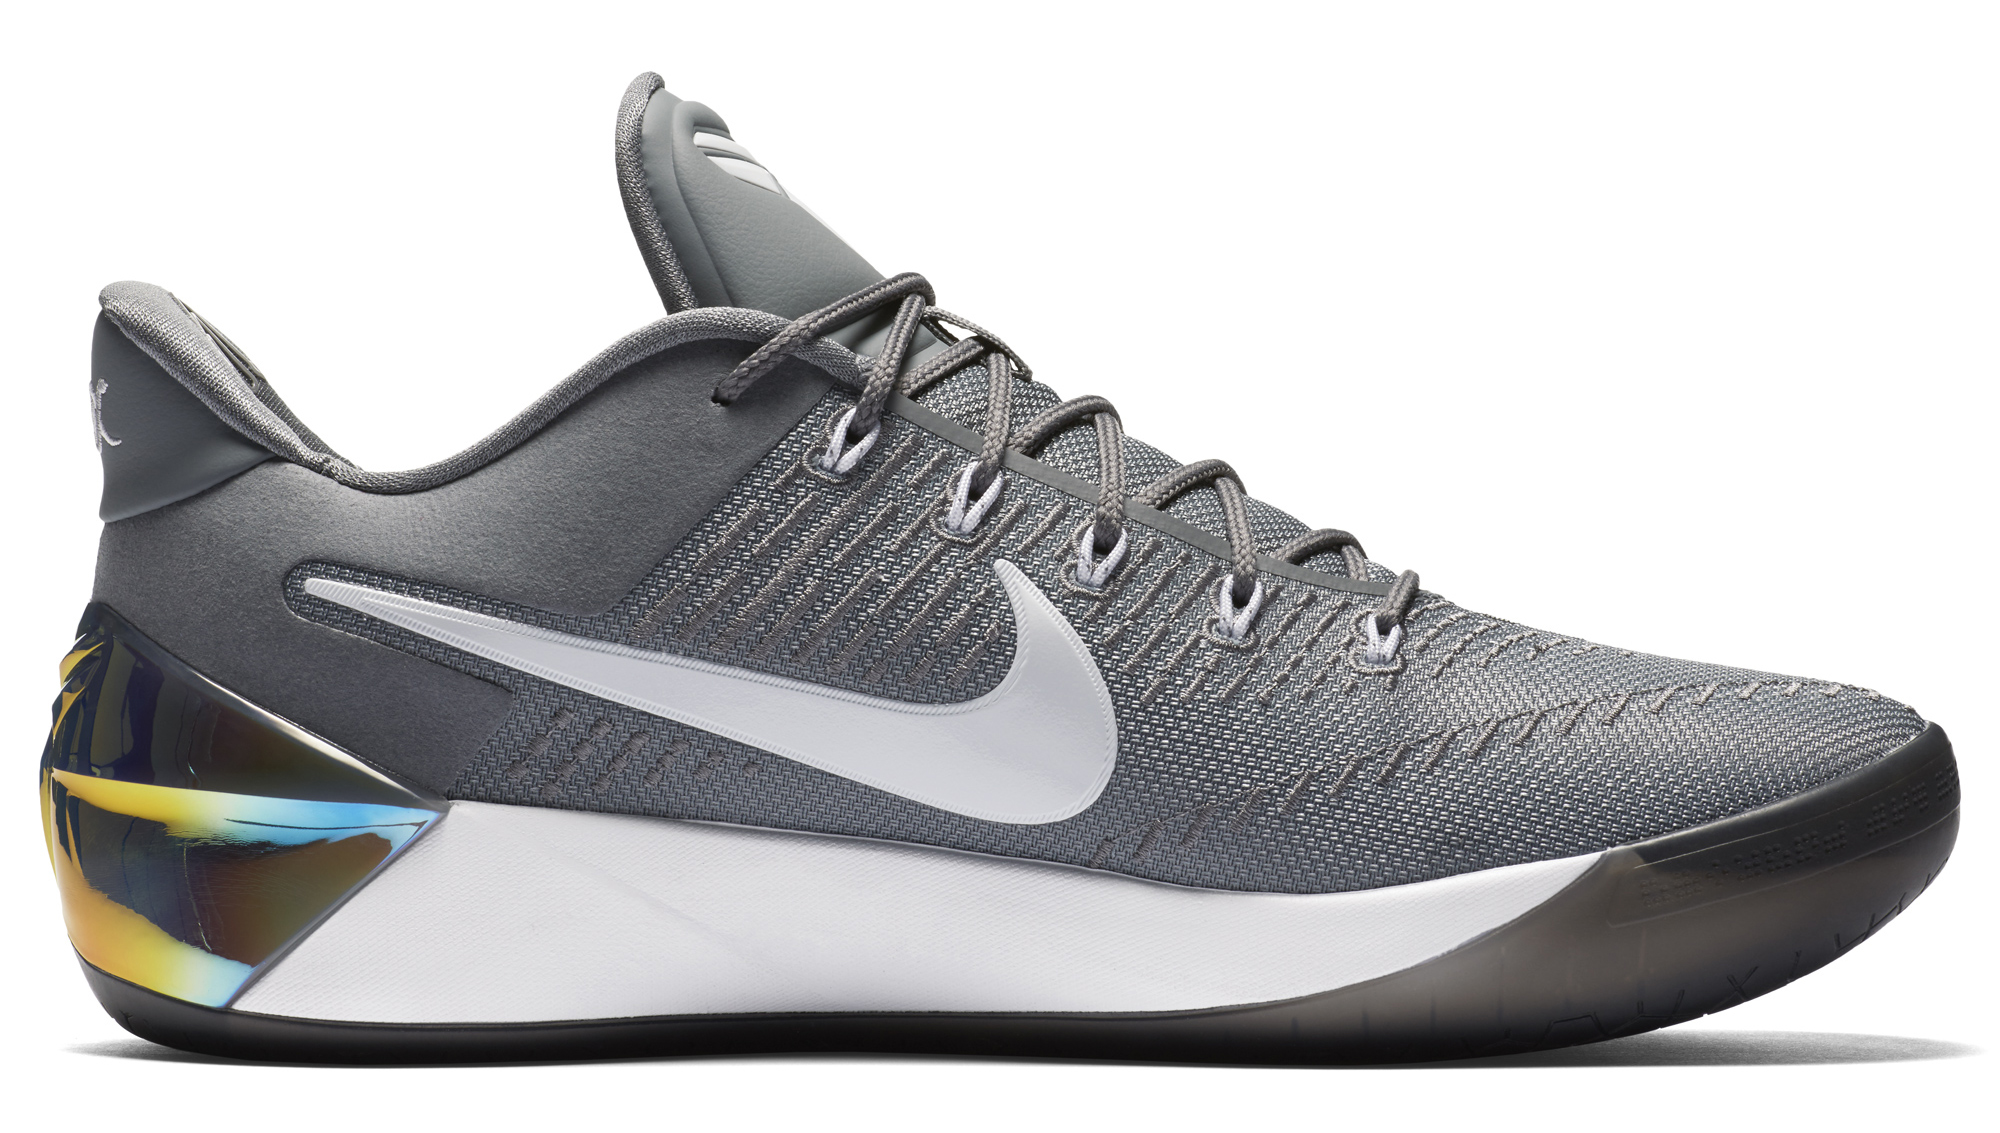 Image via Nike Nike Kobe AD Grey White Medial